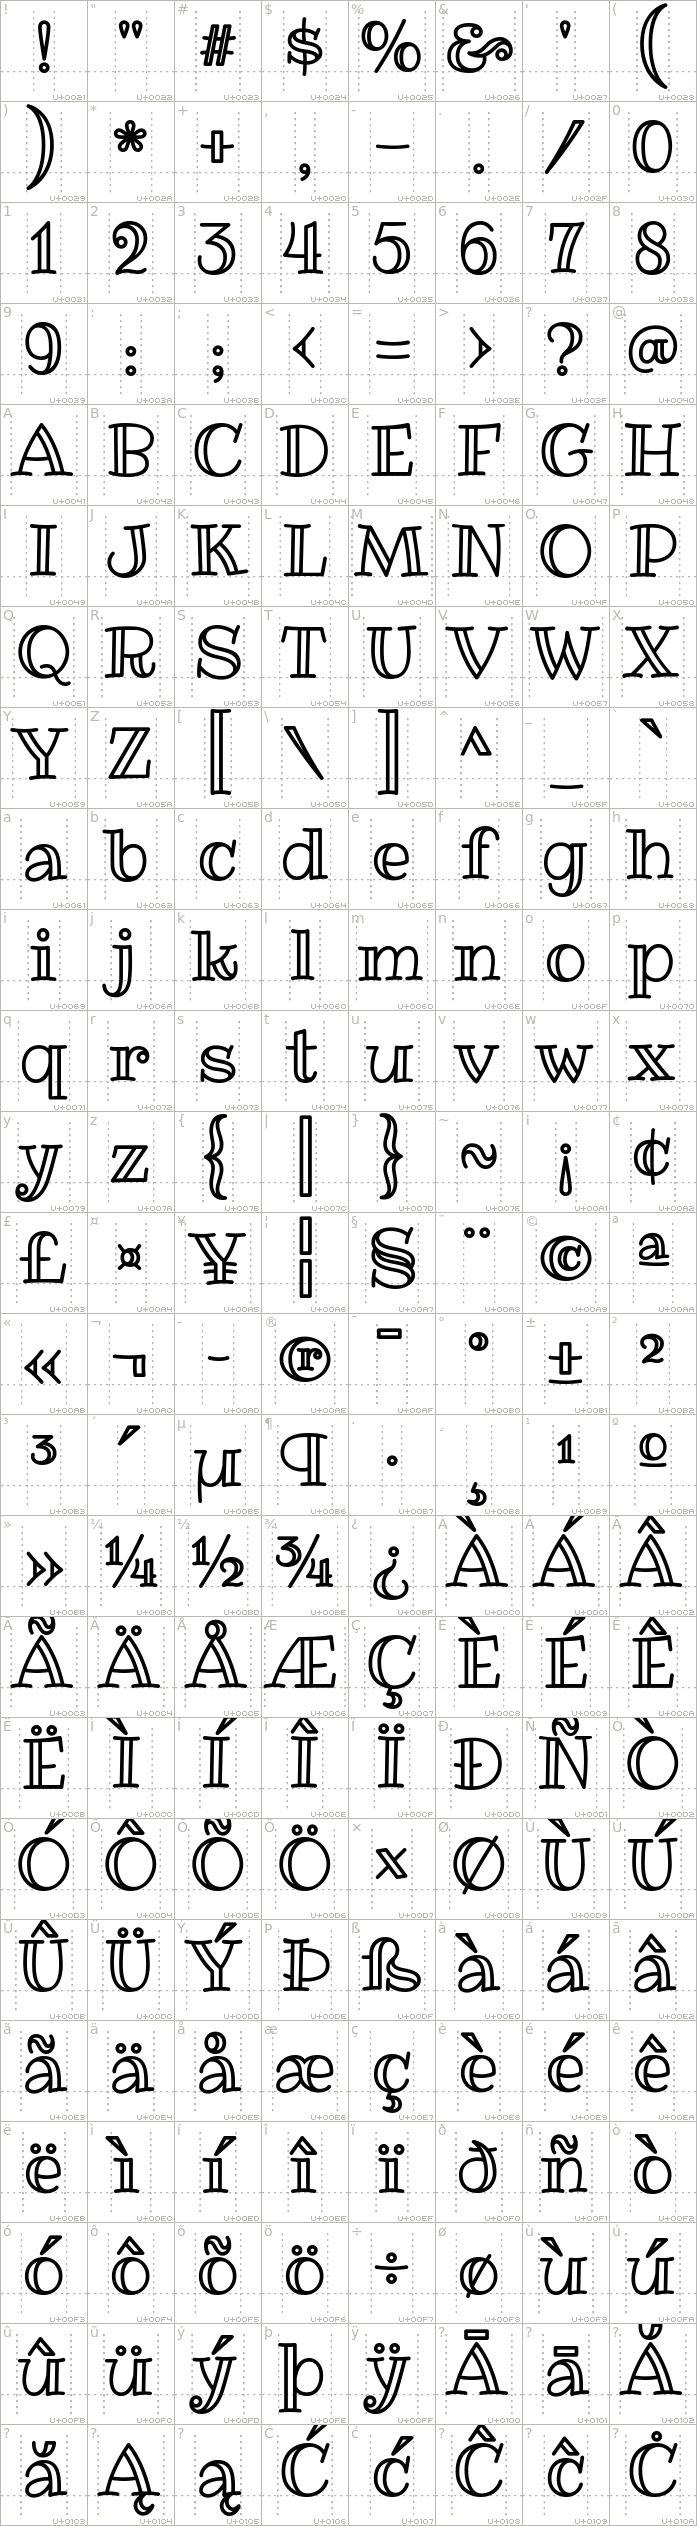 ribeye marrow font